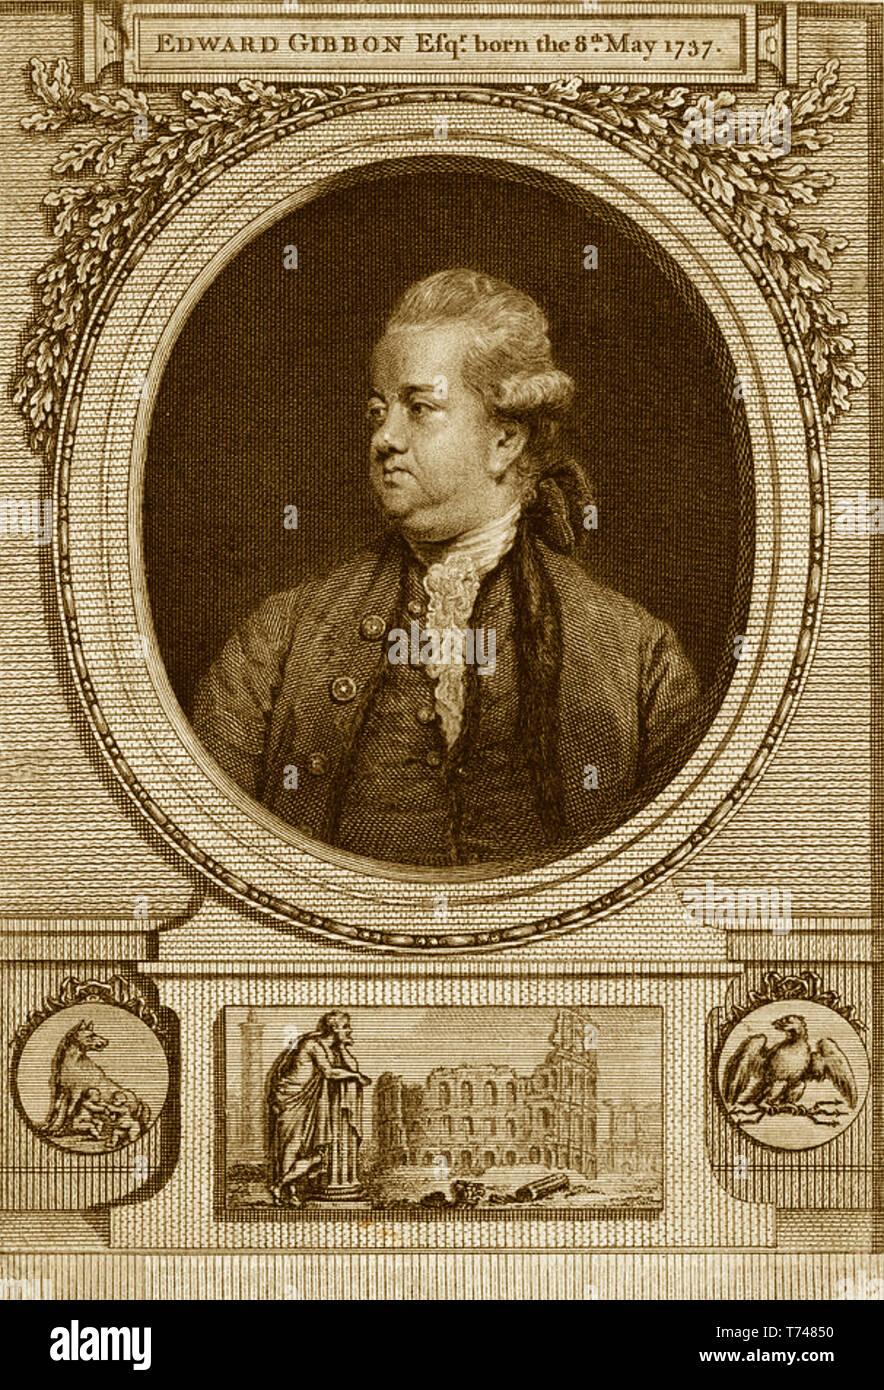 EDWARD GIBBON (1737-1794) English historian and MP - Stock Image